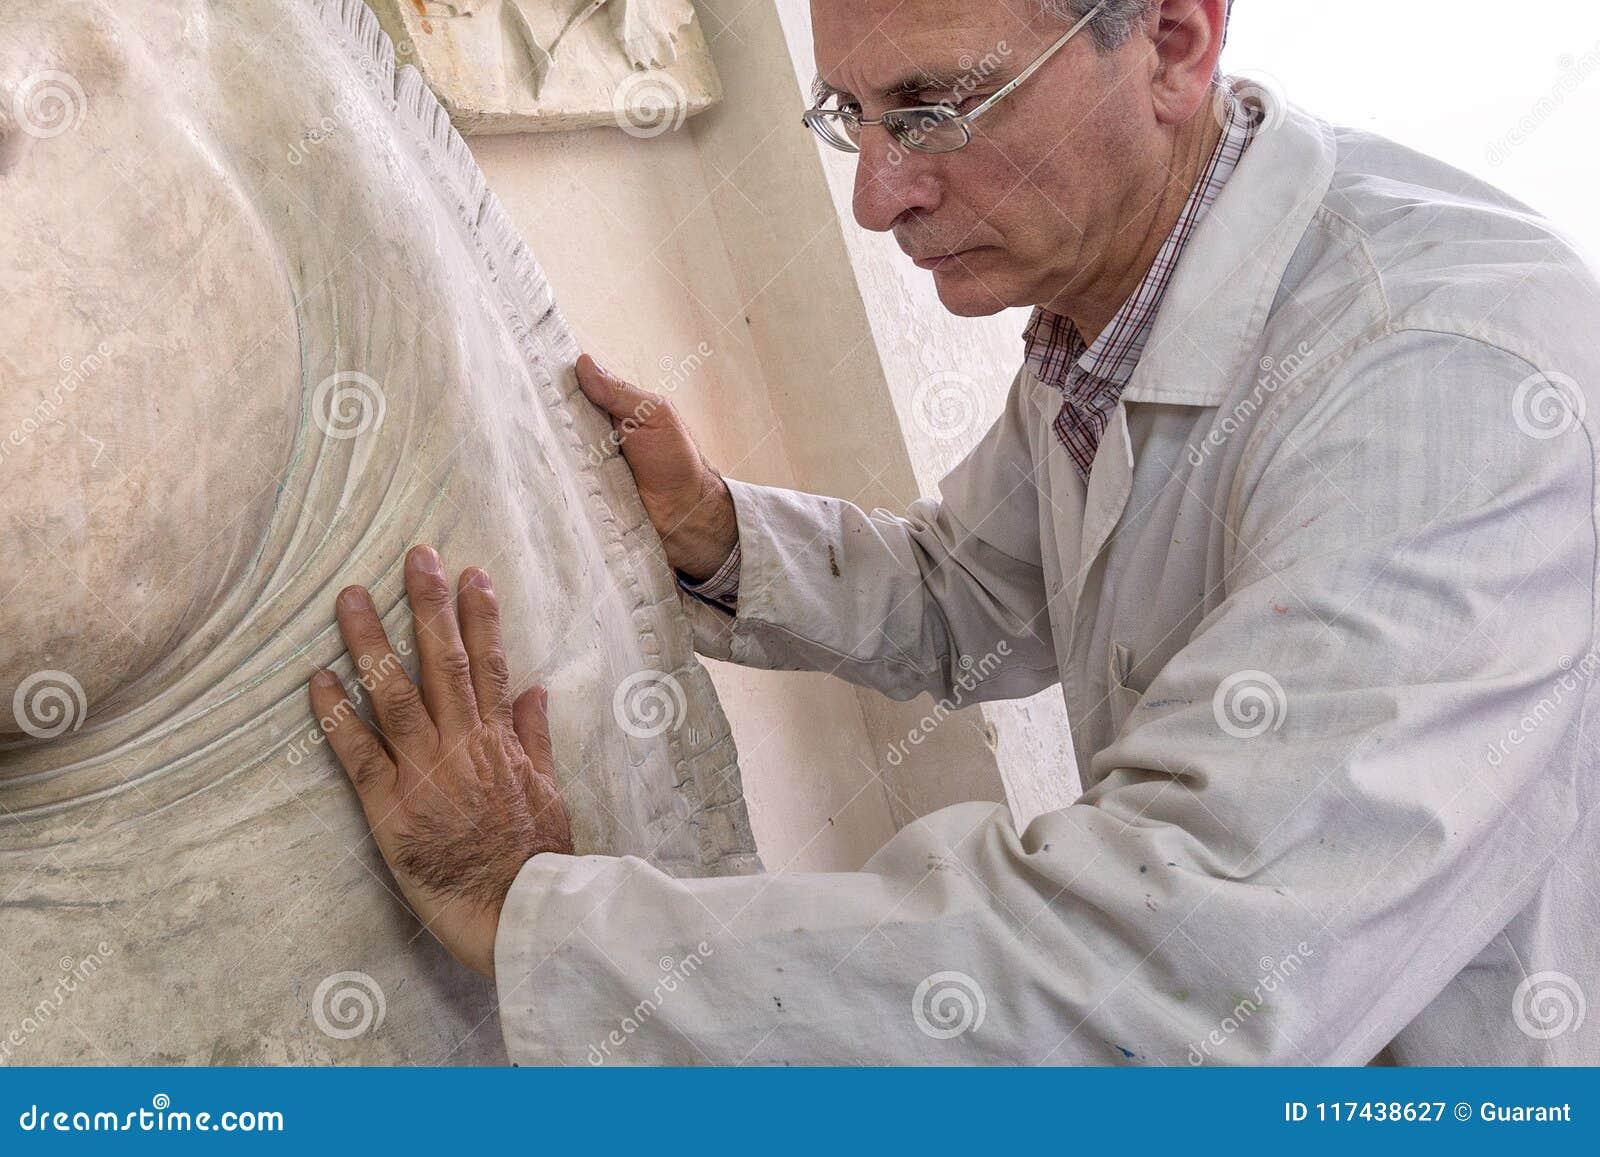 Artist gesture with hands on a sculpture in arts studio